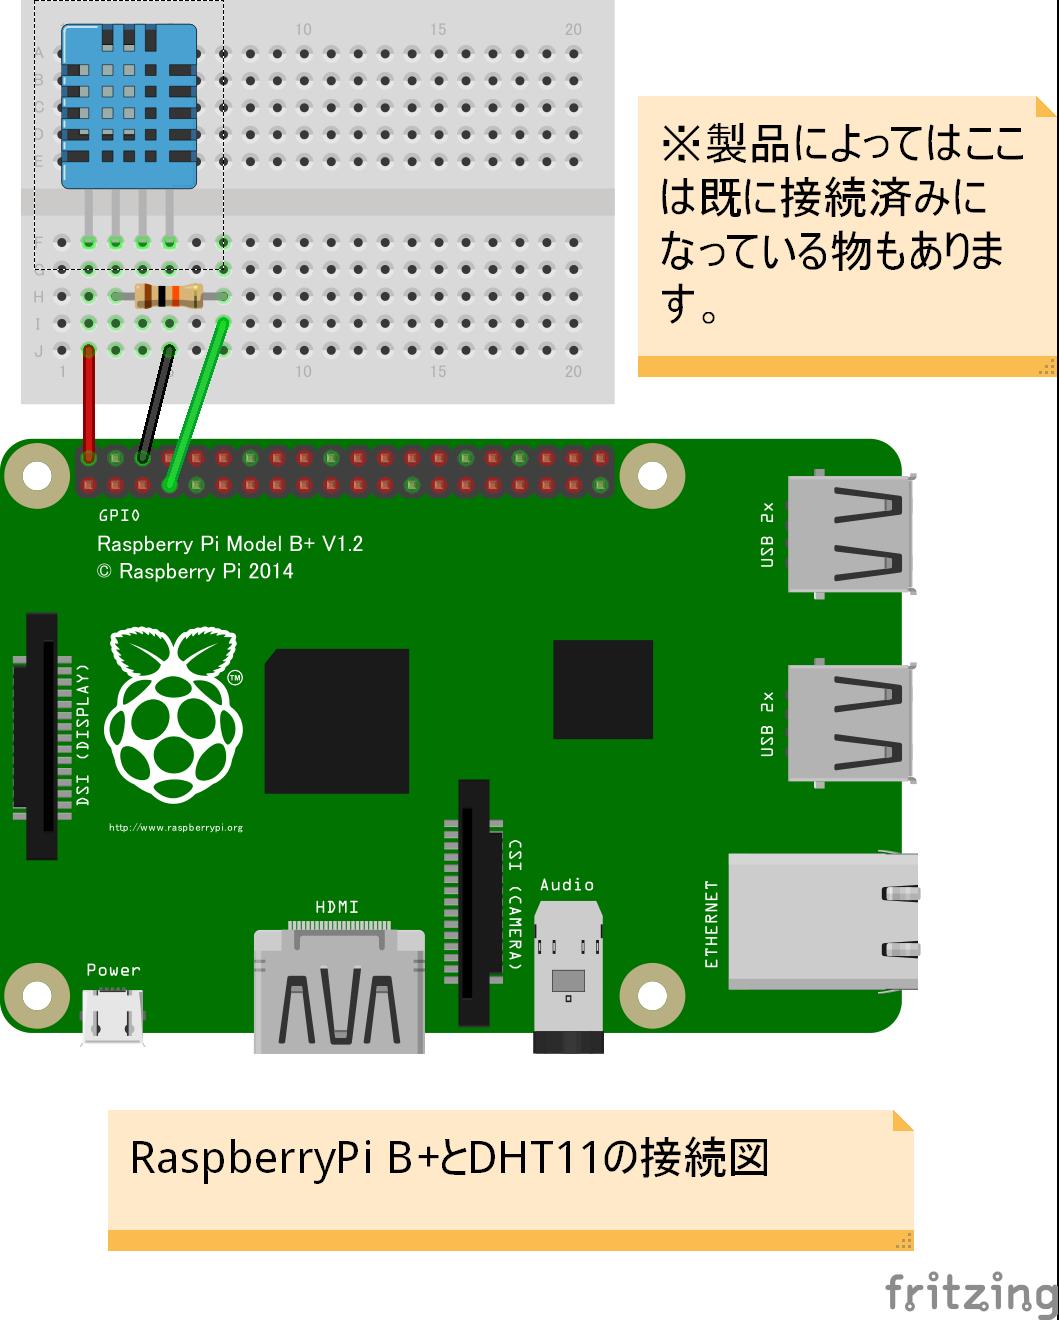 Raspberry_DHT11_ブレッドボード.png